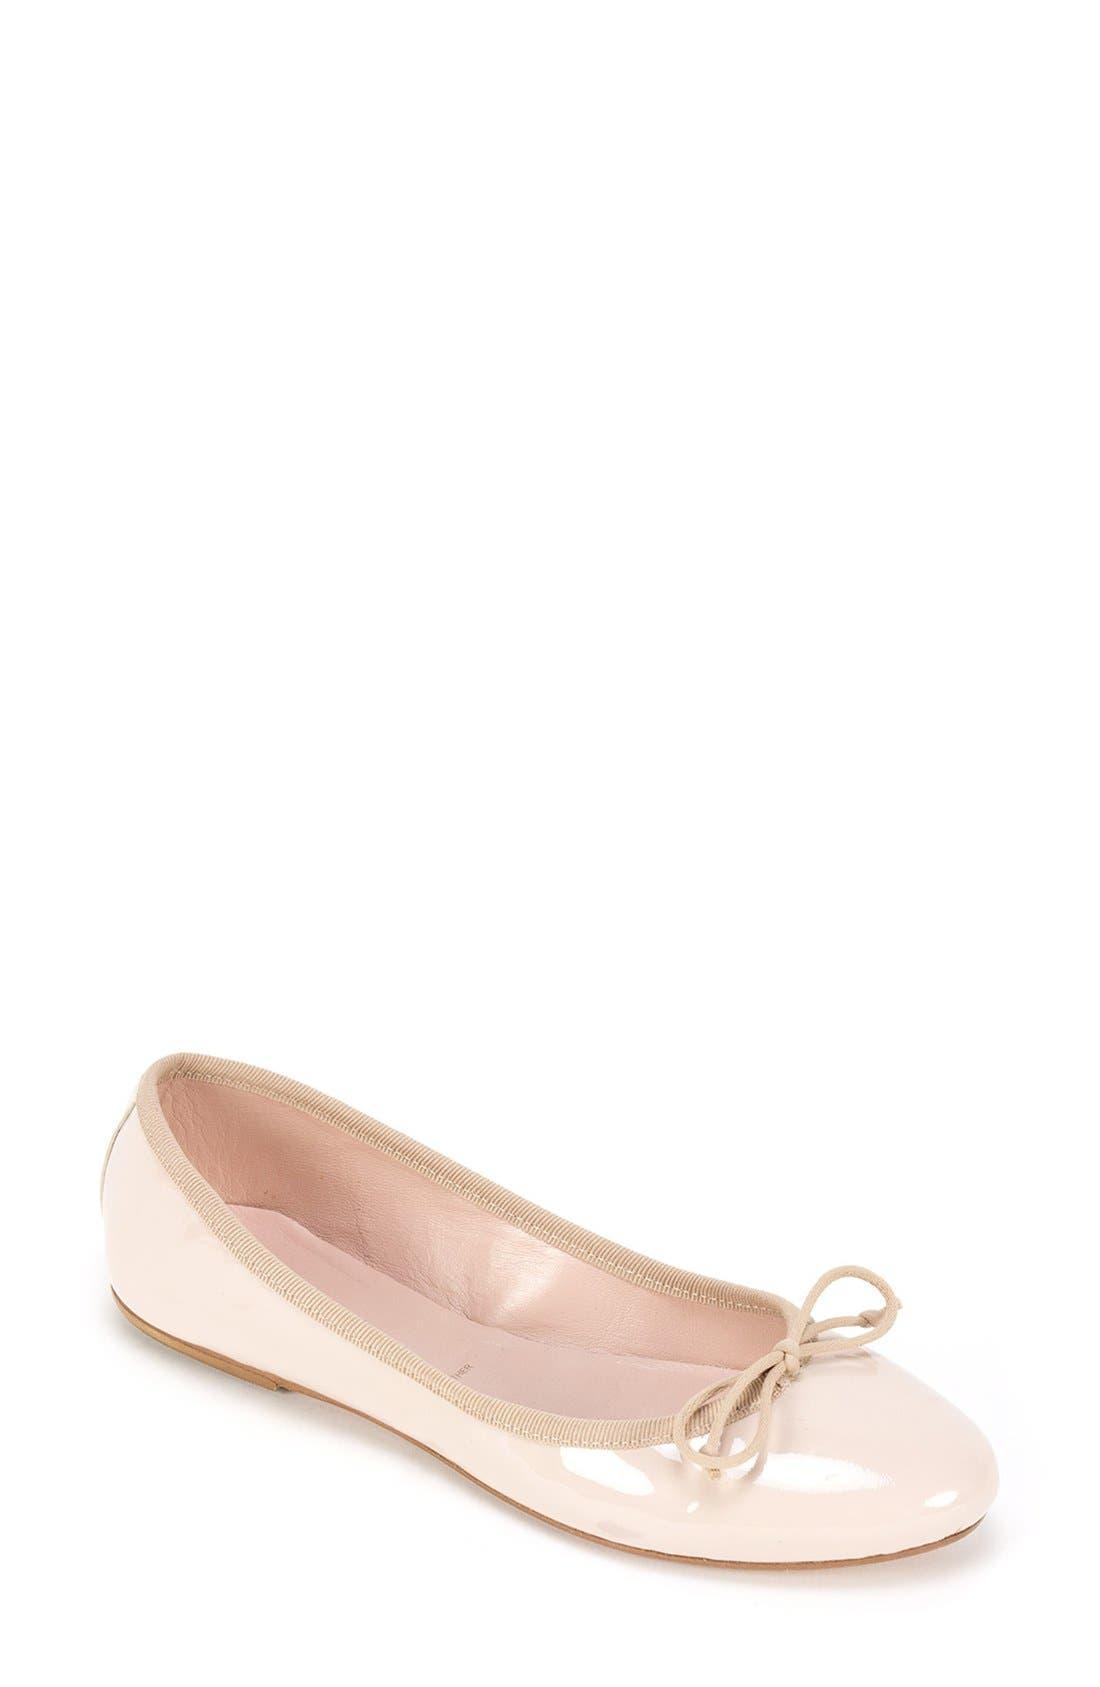 SUMMIT 'Kendall' Ballet Flat